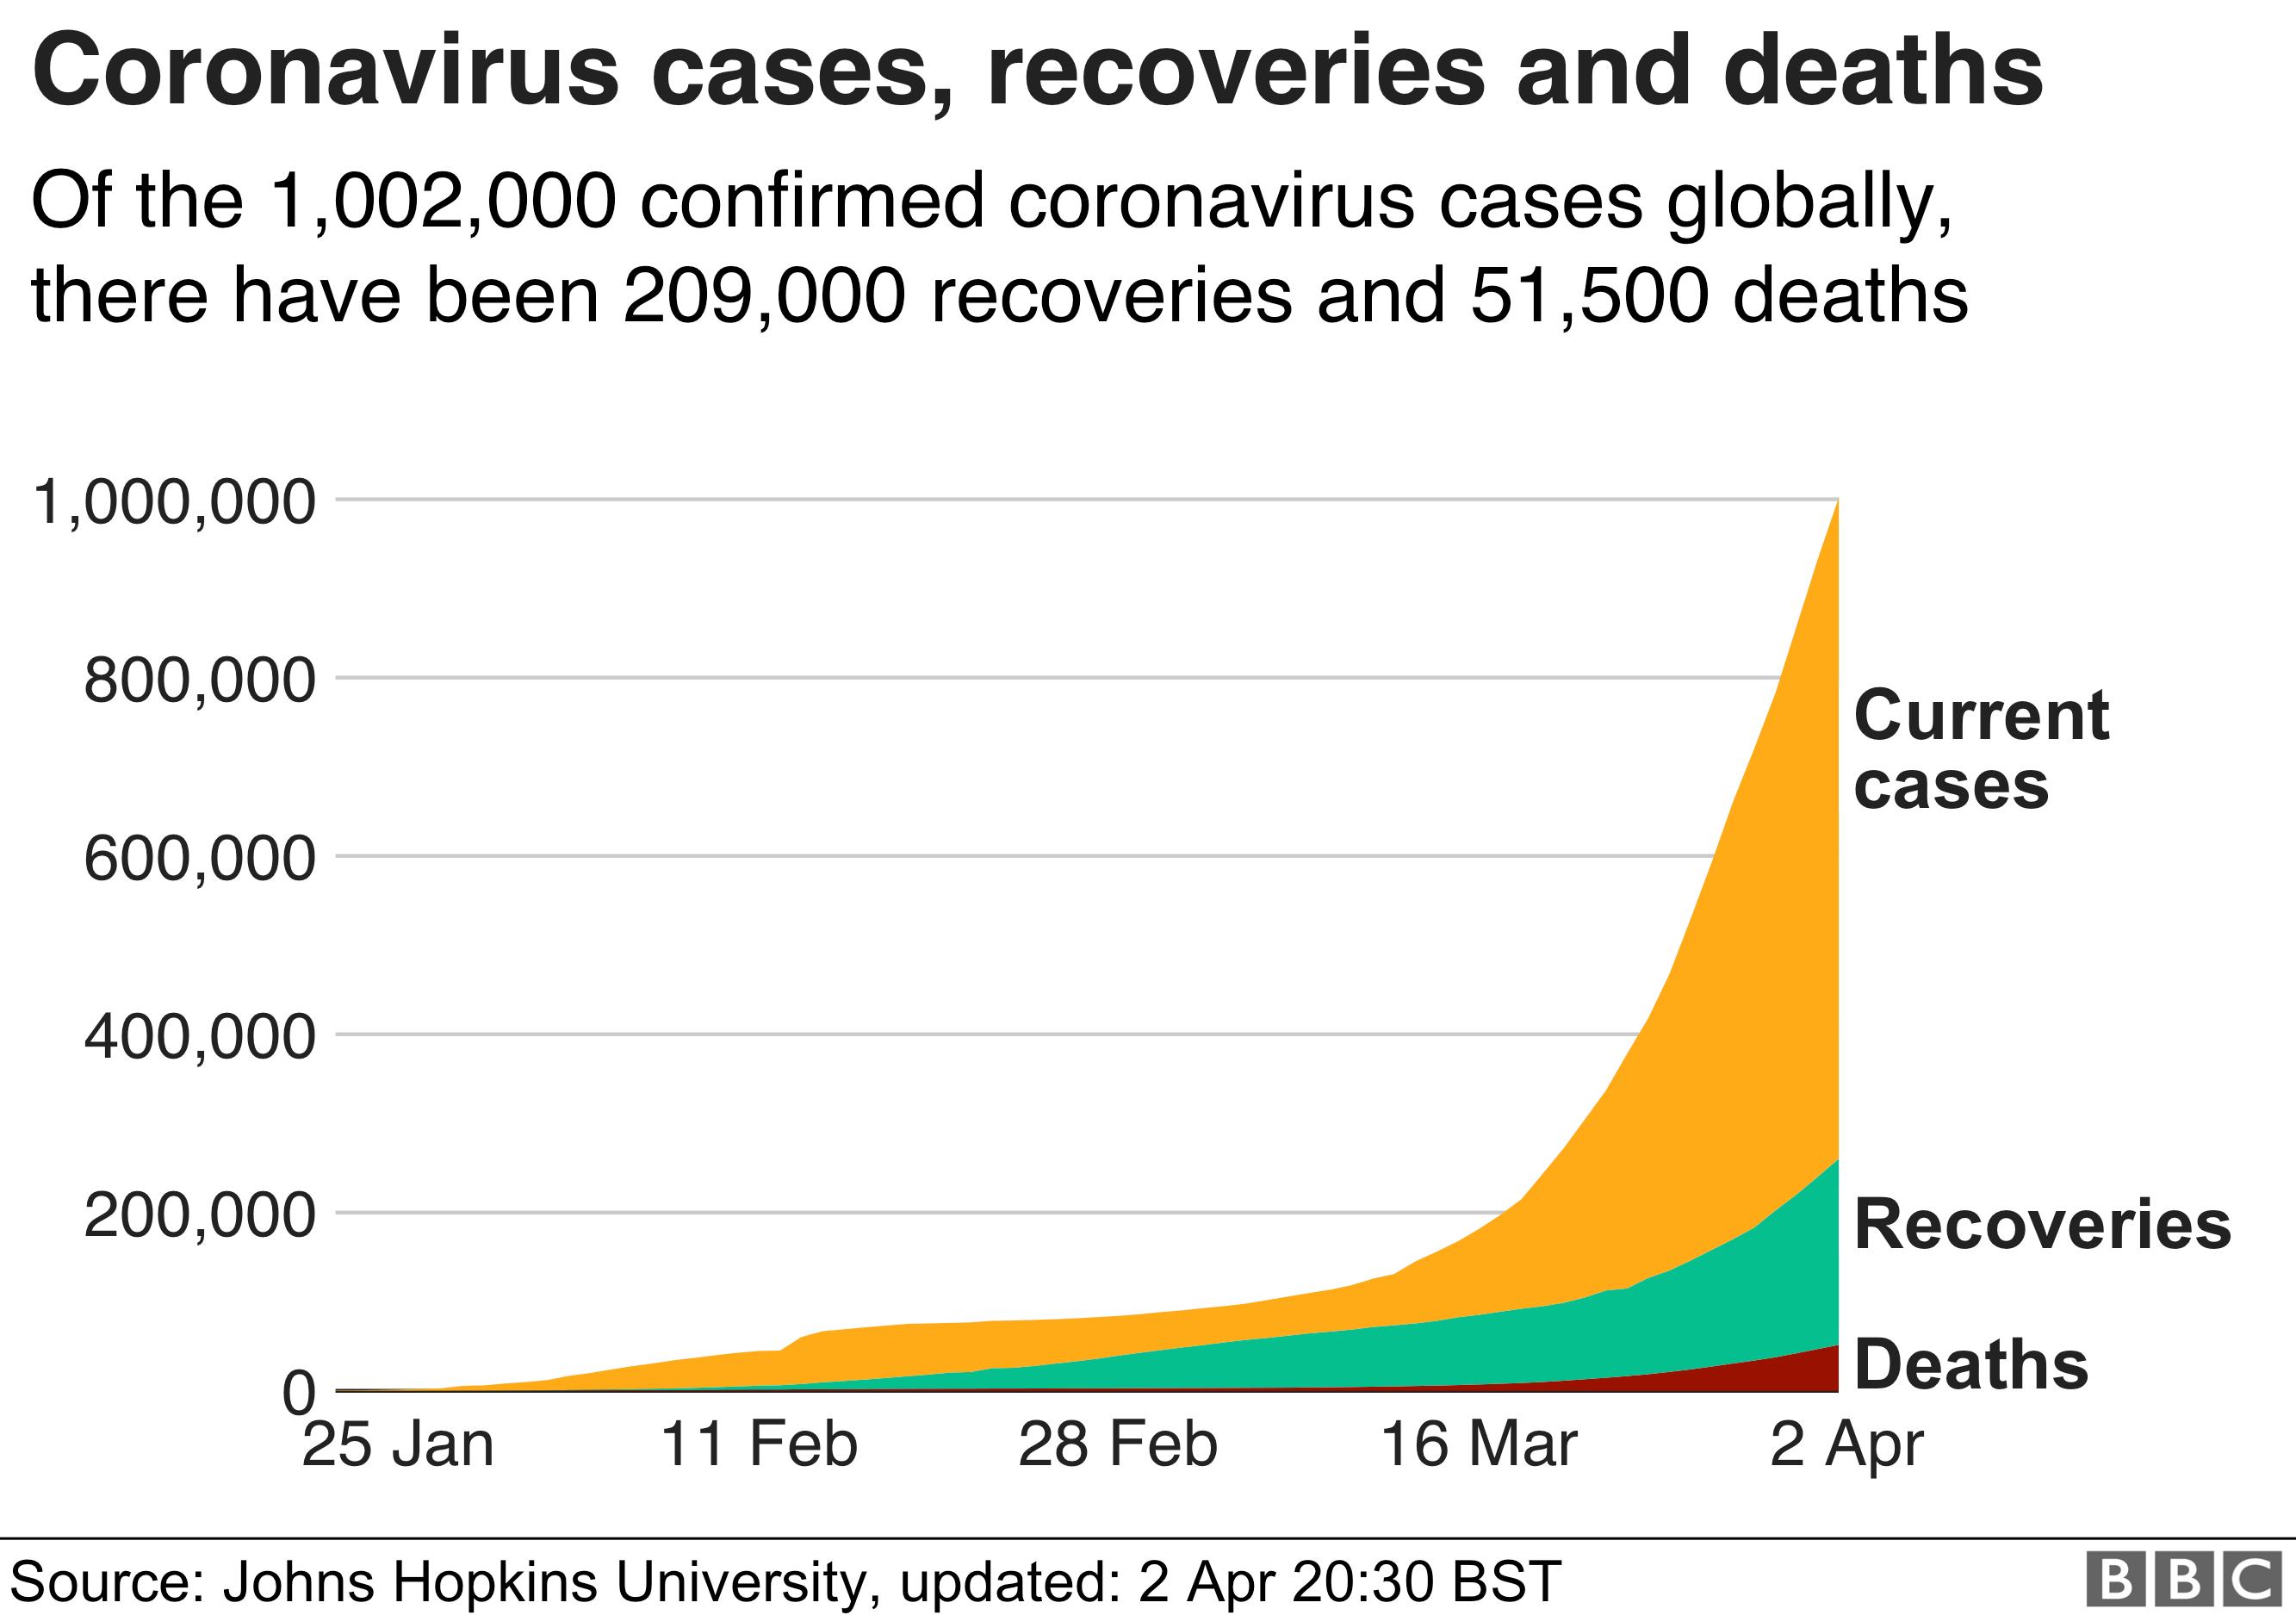 Global coronavirus cases exceed one million - 2 April